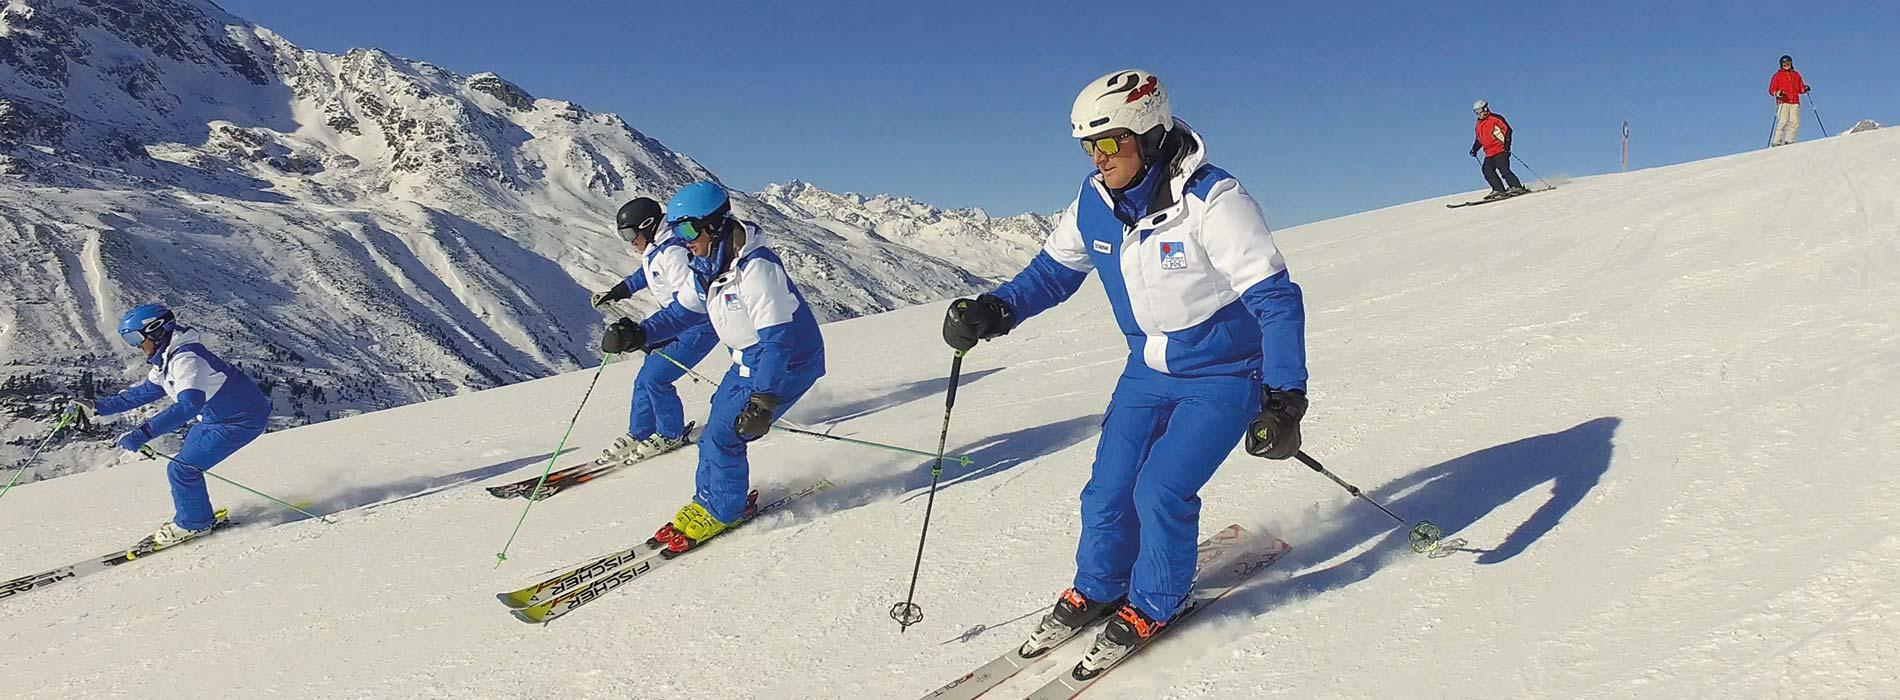 Schischule Hochgurgl Skigebiet Obergurgl Hochgurgl Tirol Ötztal